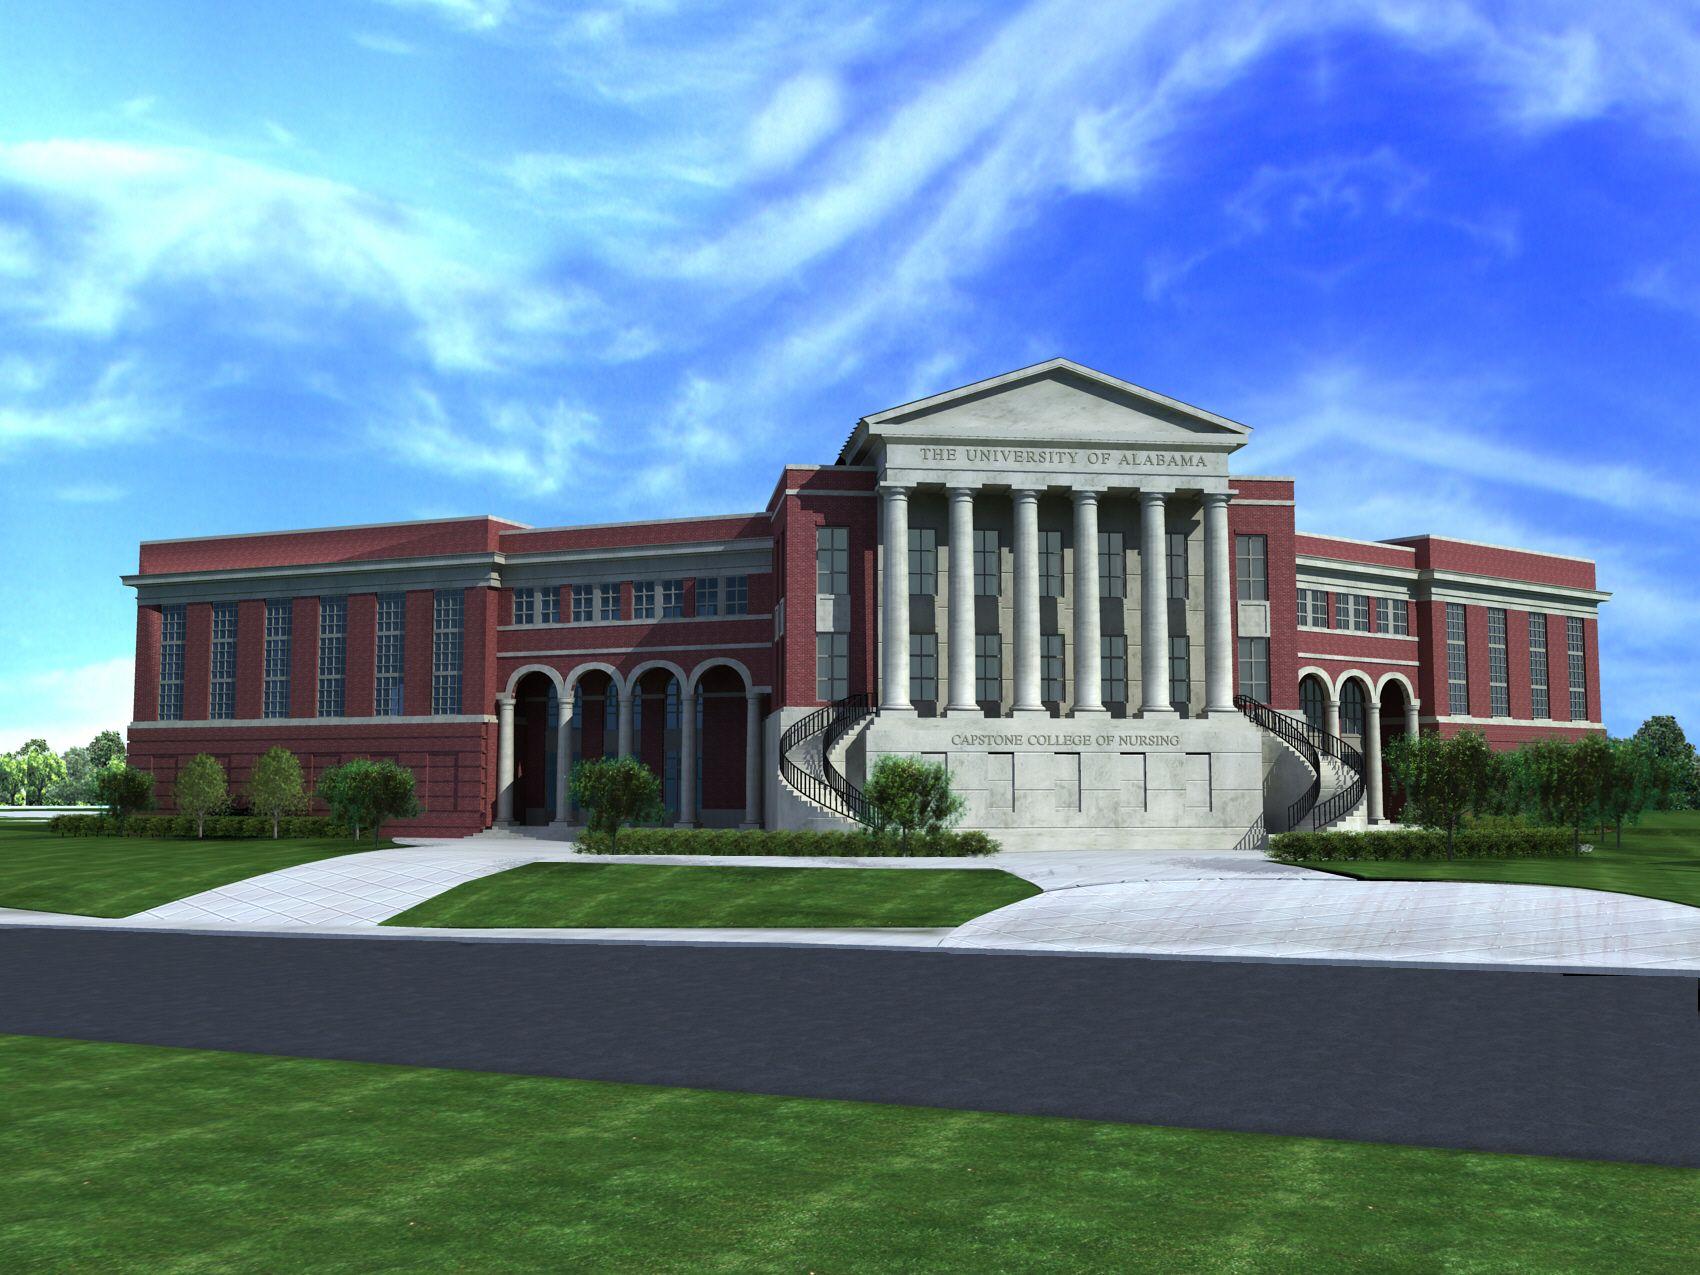 The University Of Alabama Capstone College Of Nursing Tuscaloosa Al The University Of Alabama University Of Alabama Colleges And Universities